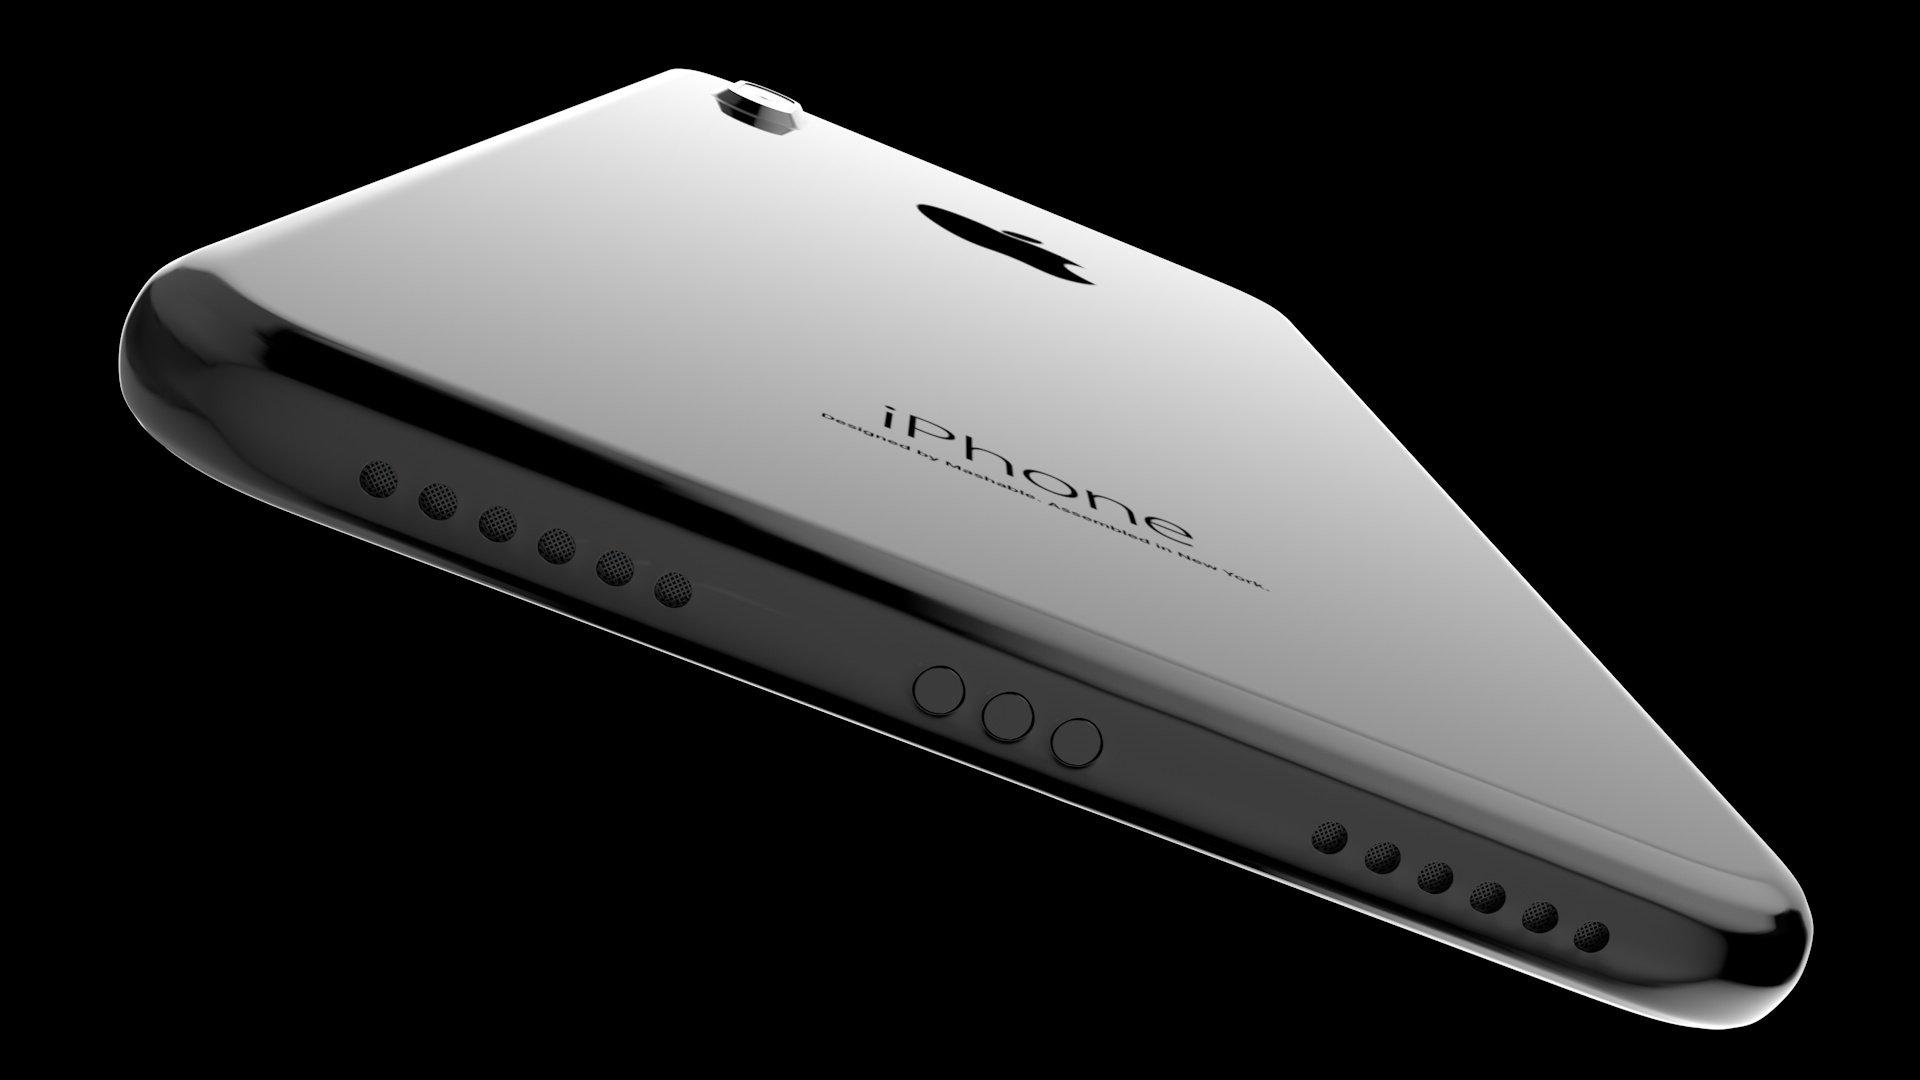 iPhone entrada de carregamento removida